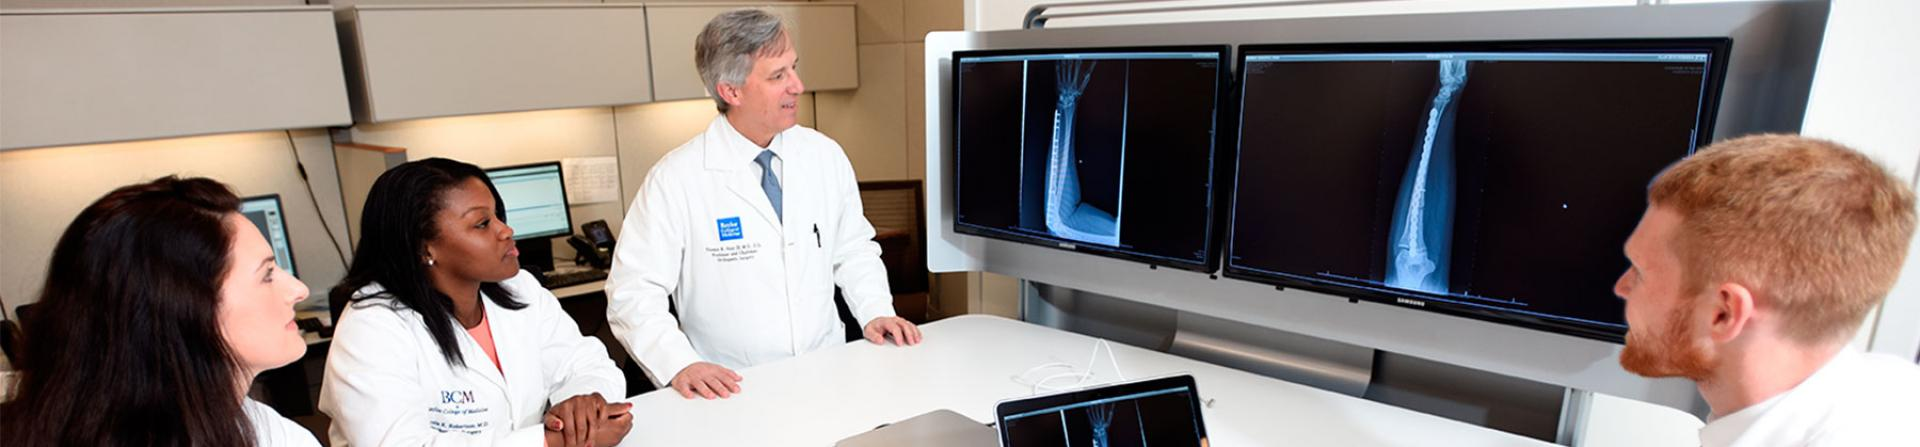 Baylor Orthopedic Surgery Residency Program